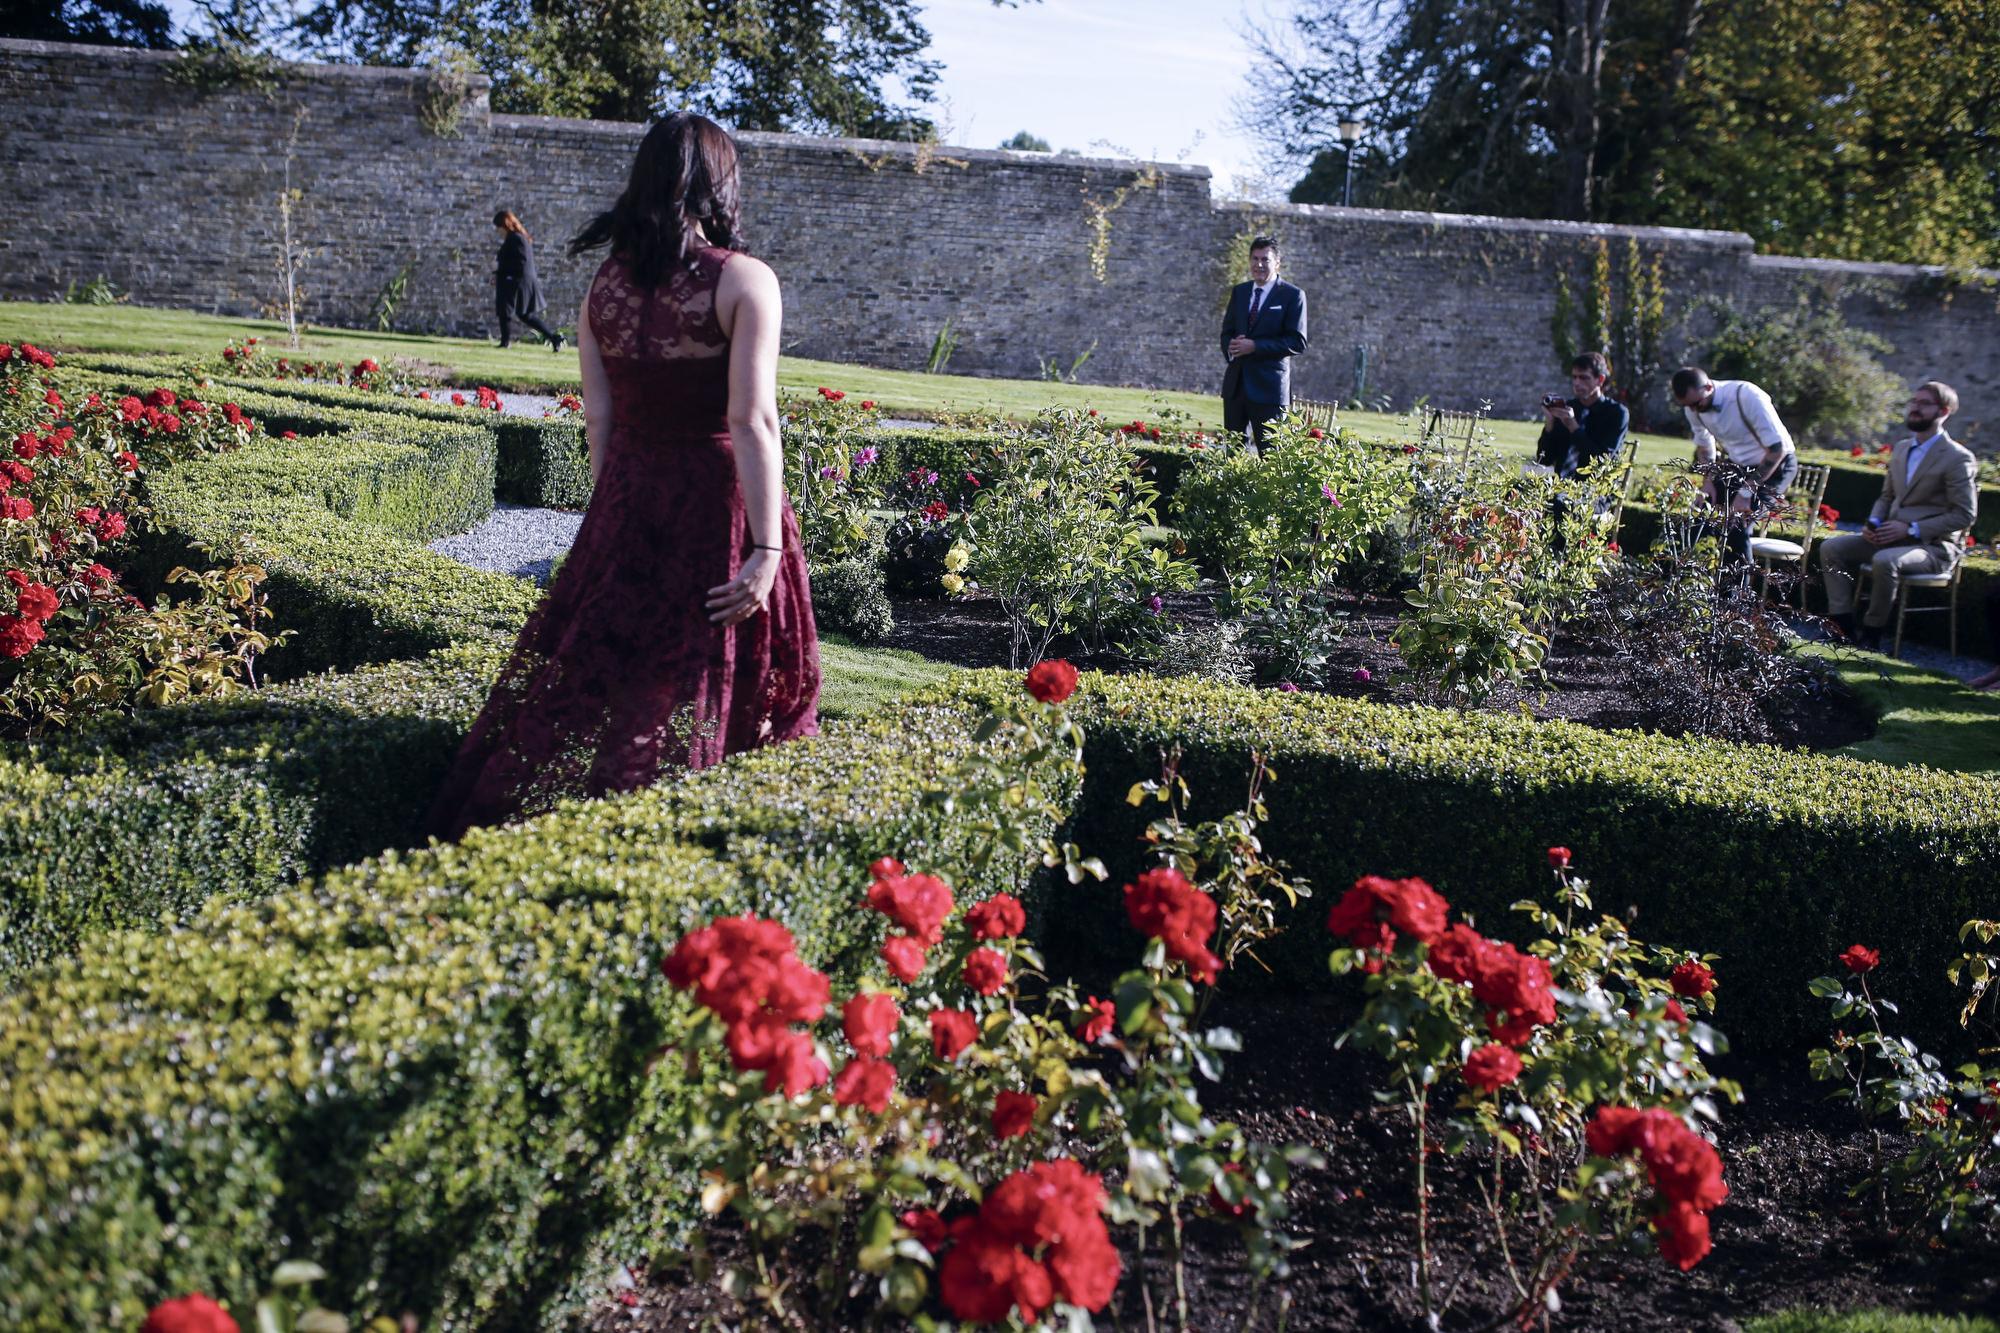 kilkea_castle_wedding_photographer_goldenmoments_024.jpg